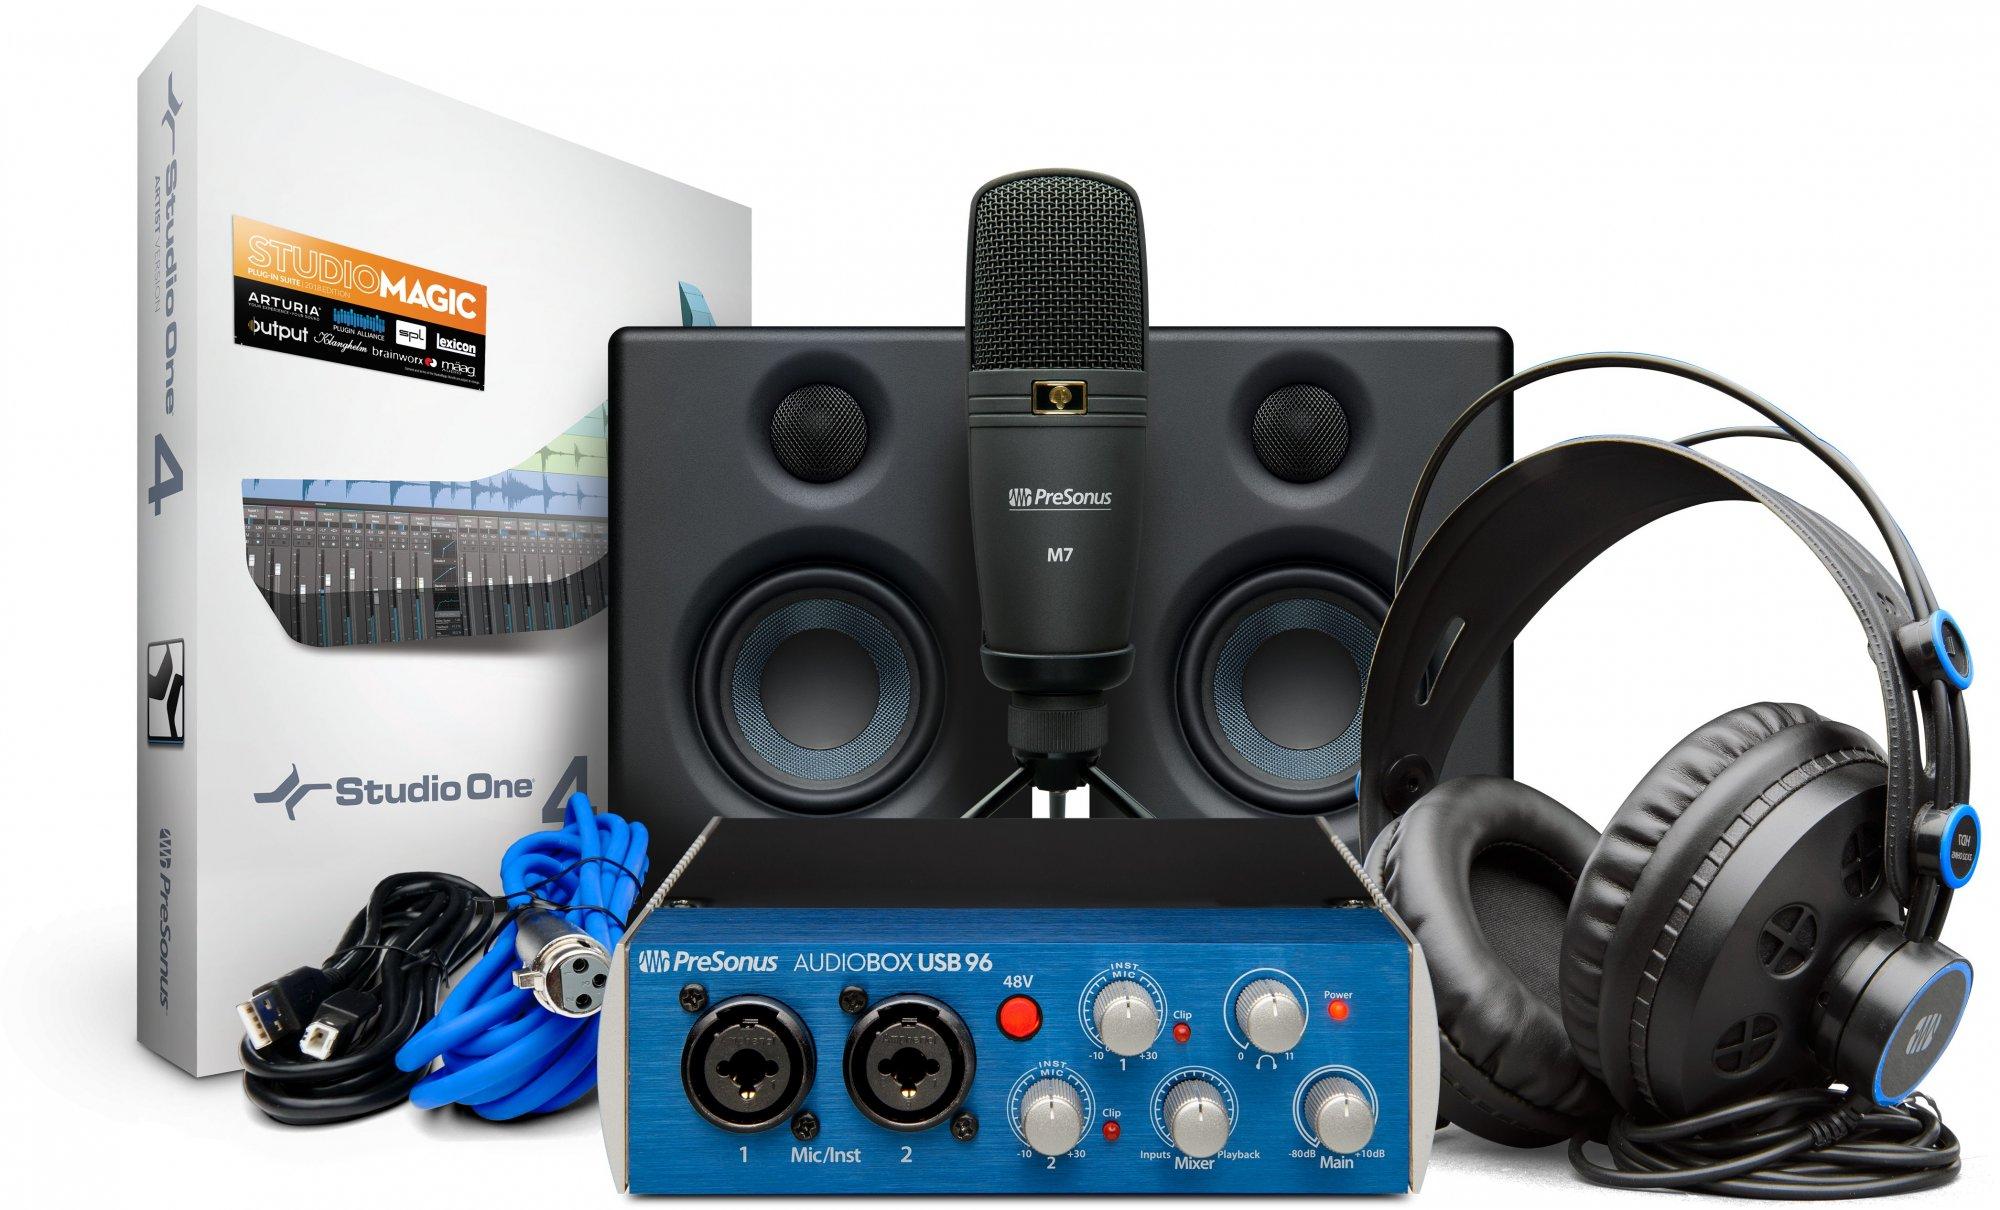 PreSonus AudioBox Studio Ultimate Recording and Production Studio Bundle